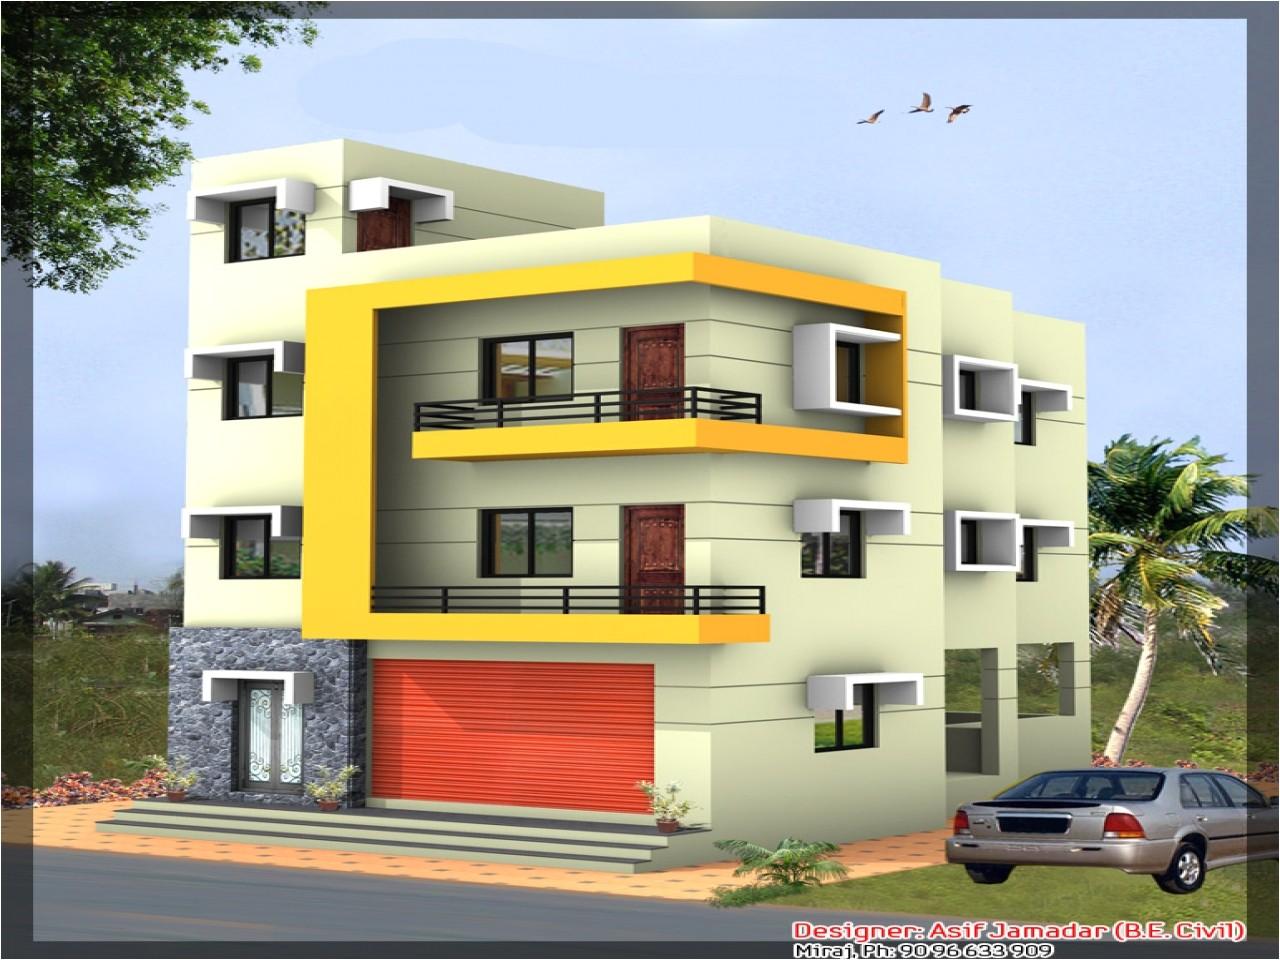 9d4e04e2696b6e1d 3 story house plans luxury 3 story house plans